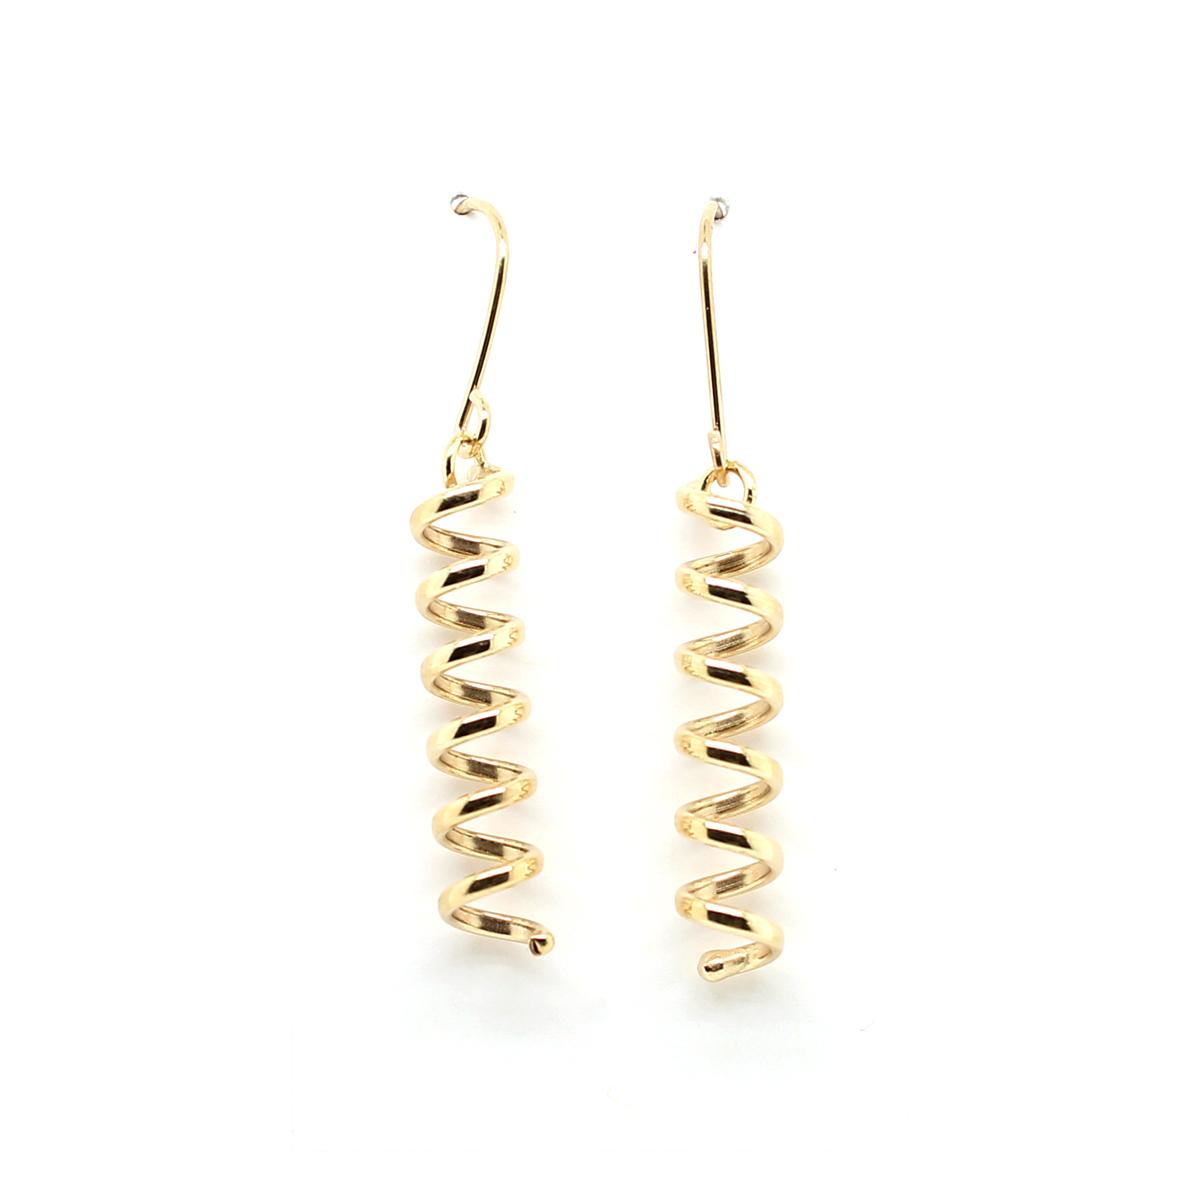 Vintage 14 Karat Yellow Gold Elongated Coil Earrings